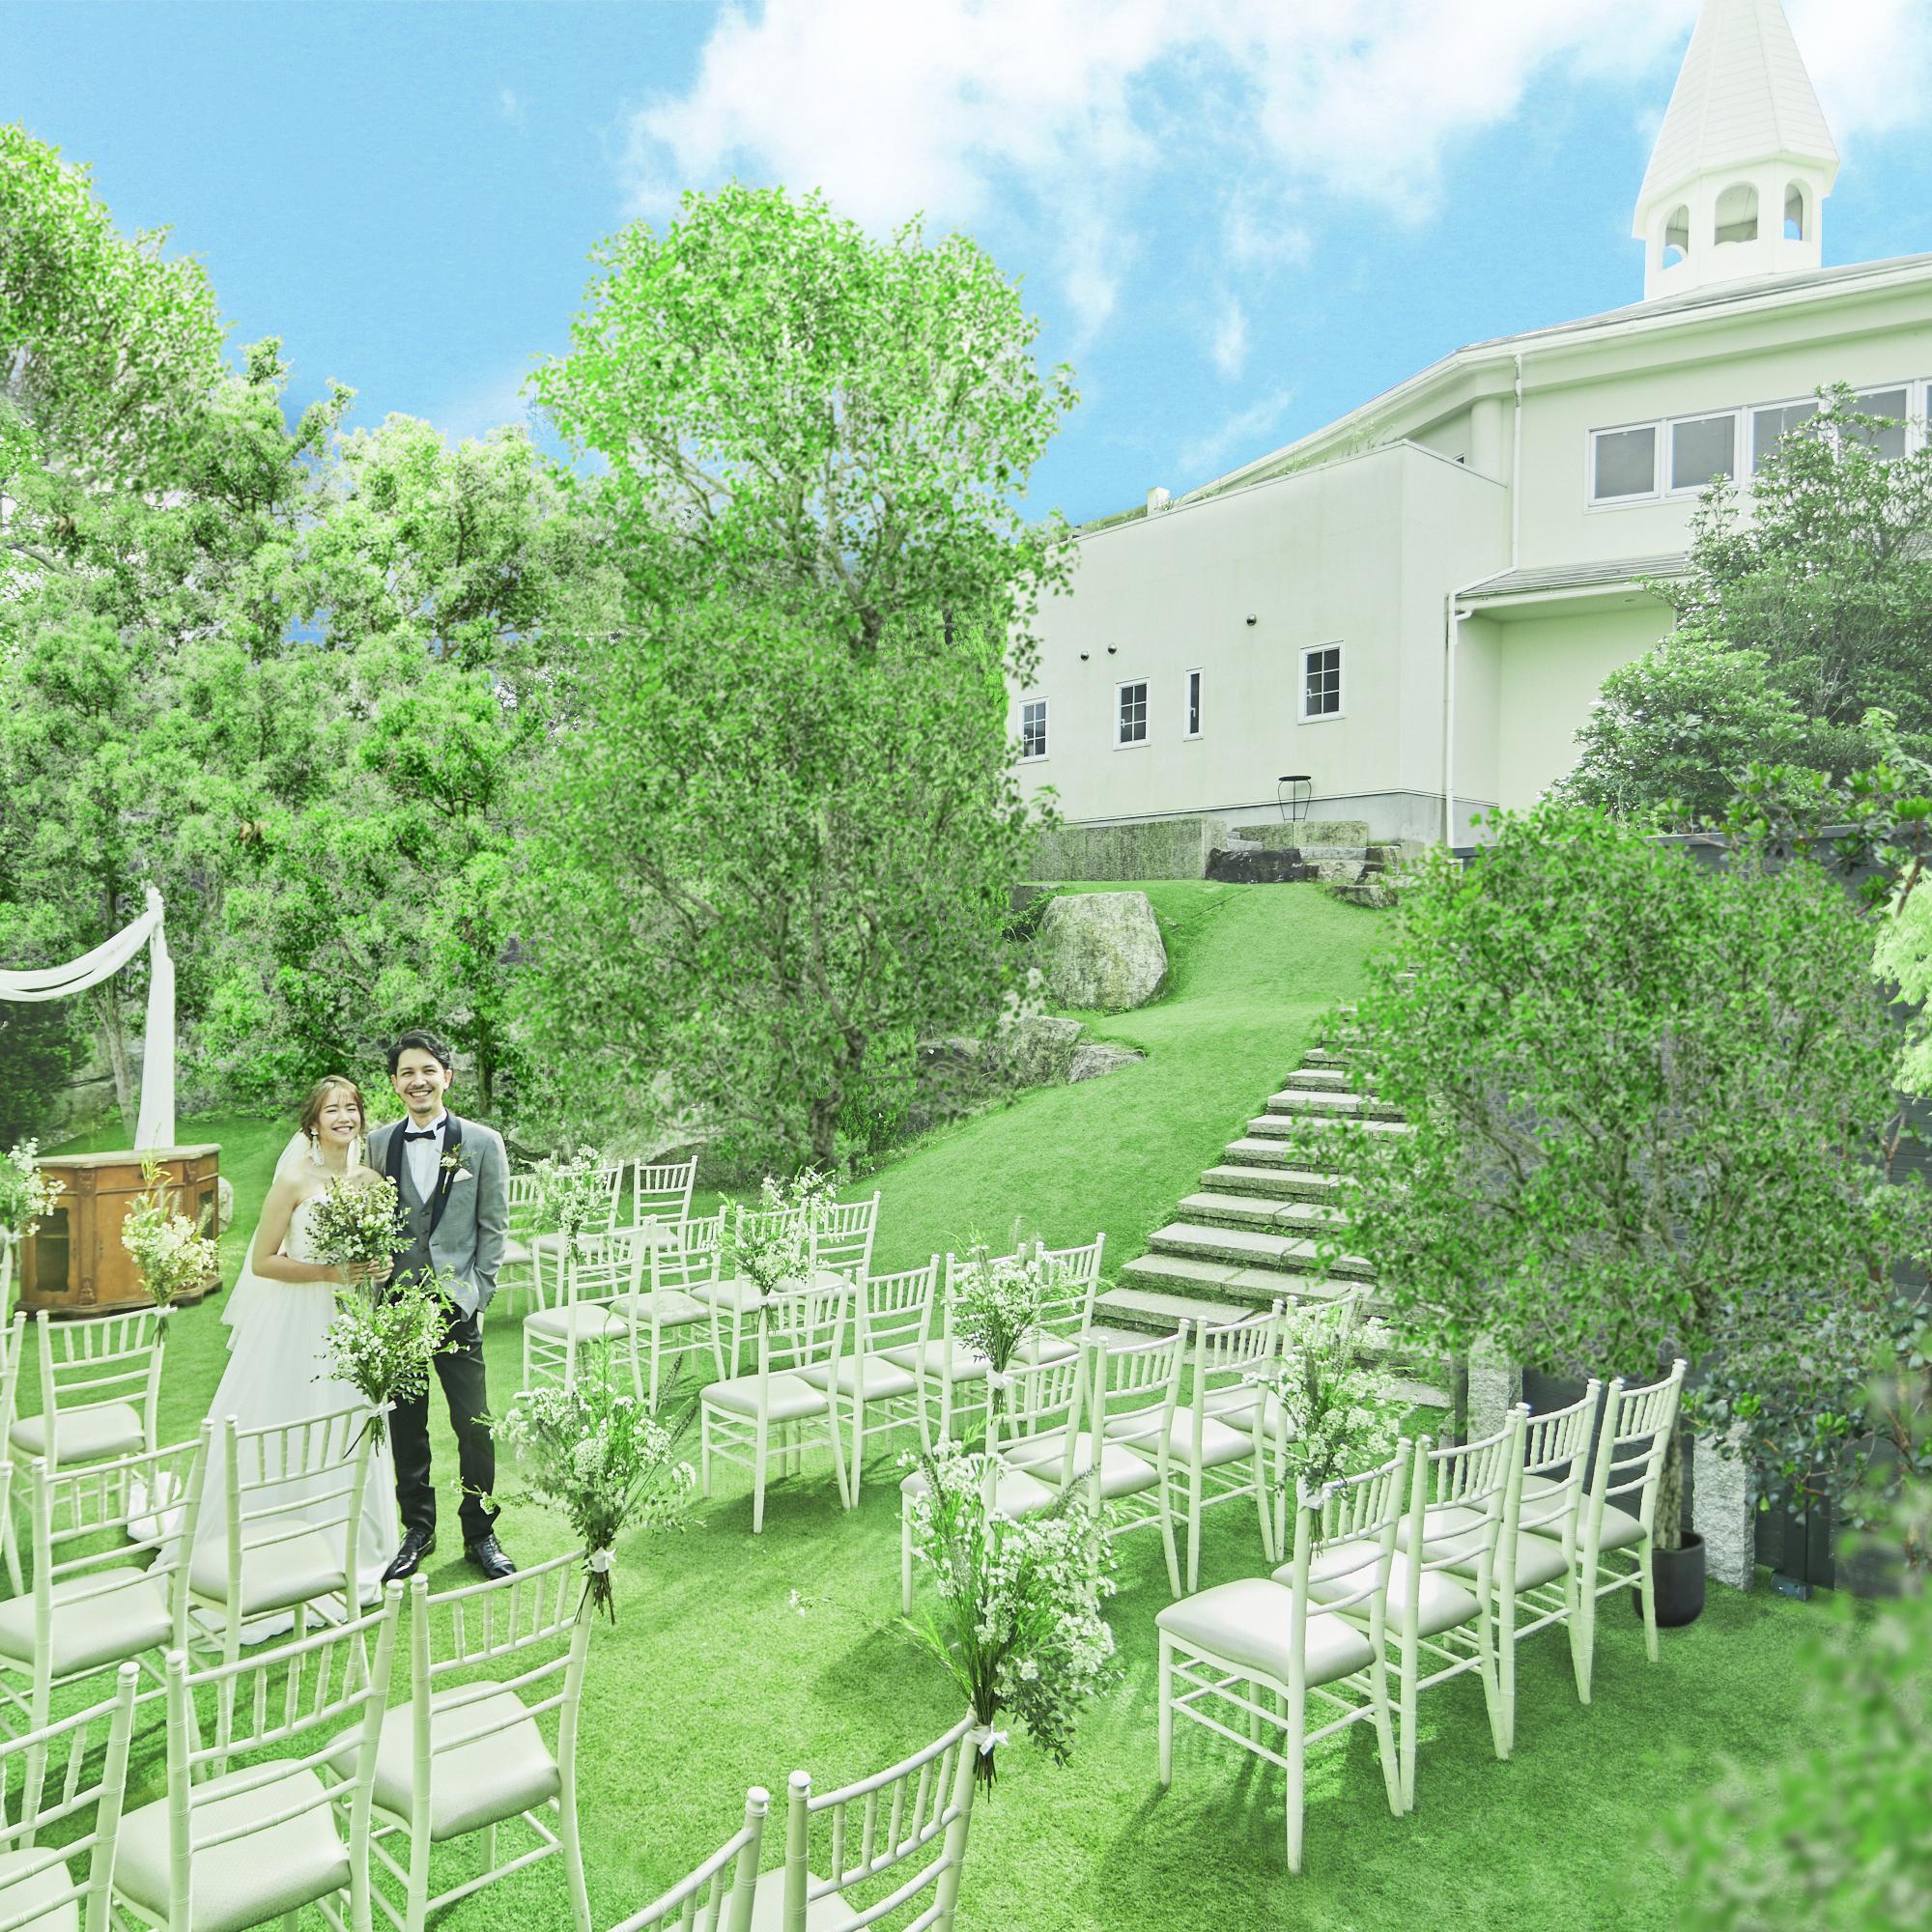 Rapport The Garden NAGOYA|ラポール ザ ガーデン ナゴヤ